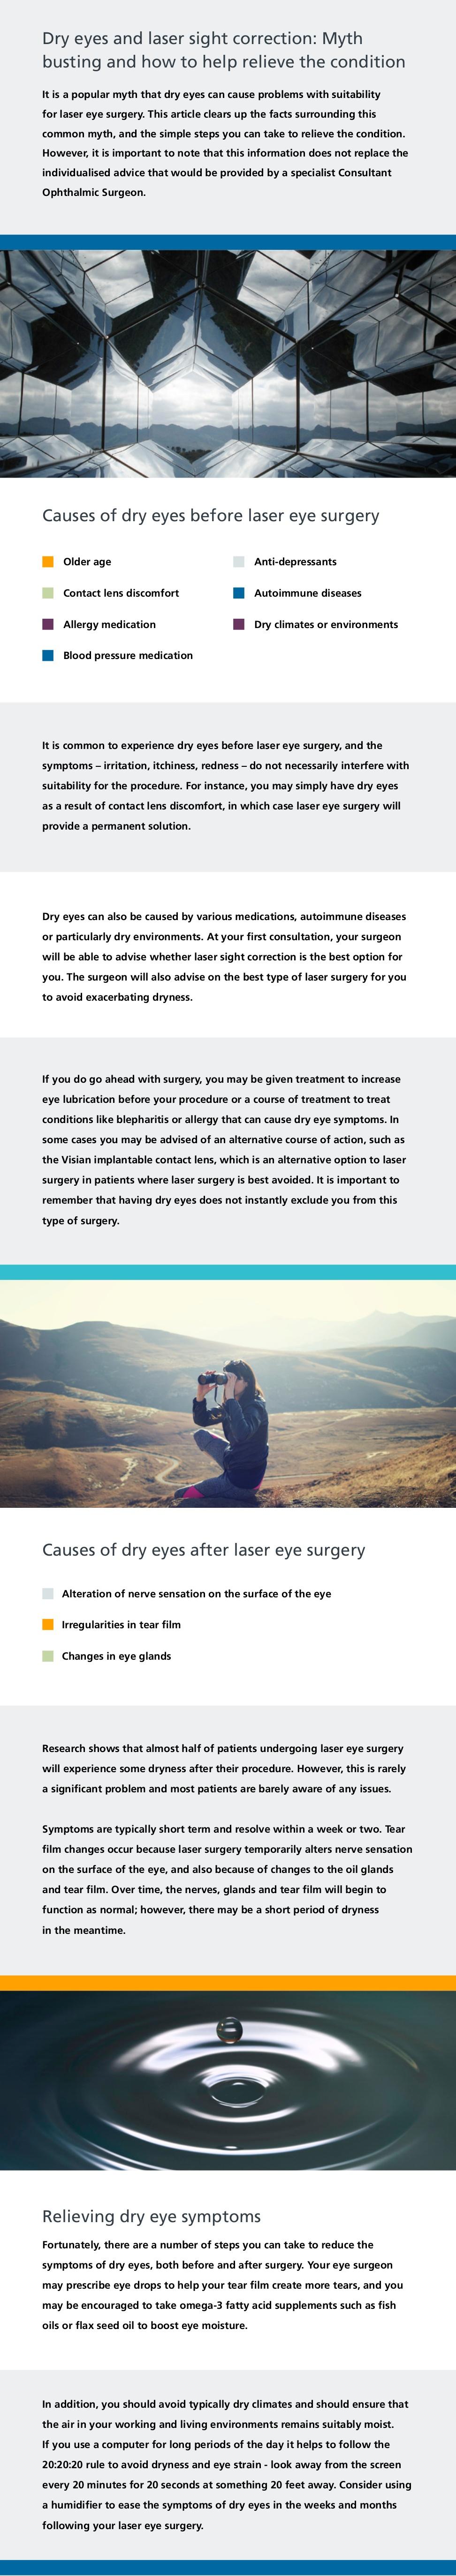 33509_consumer-blog-laser-sight-dry-eyes-v6.jpeg